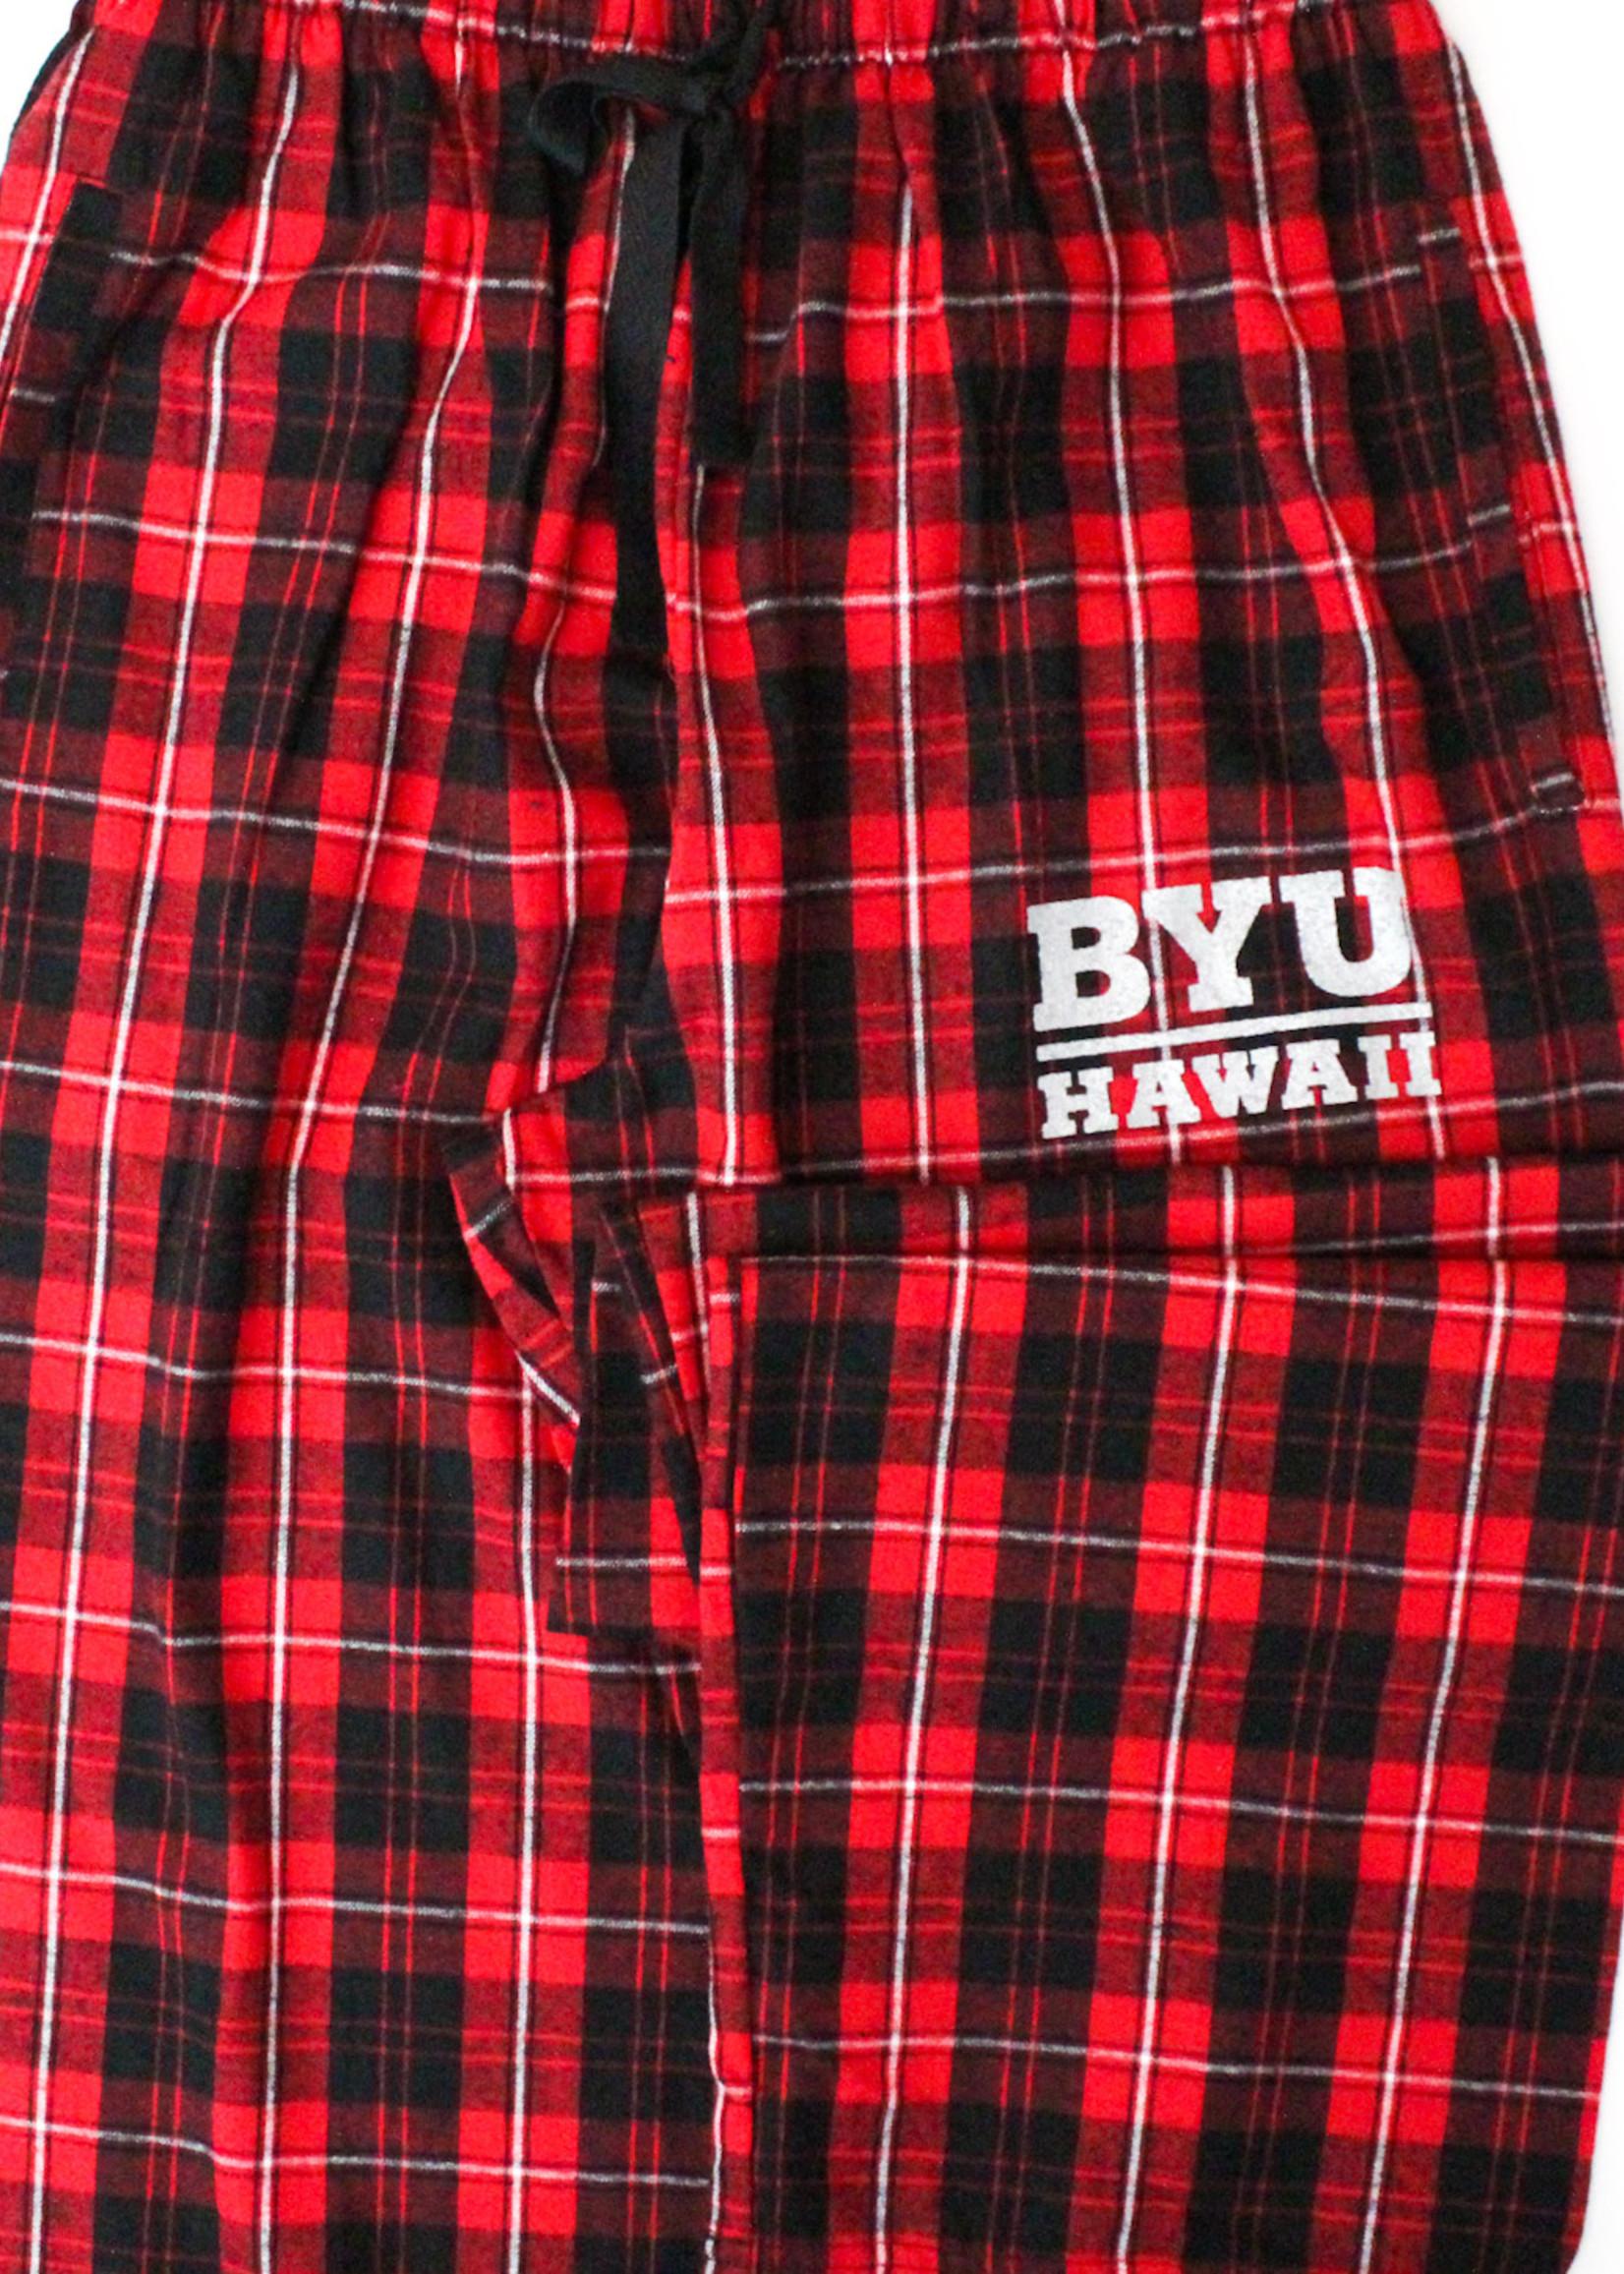 Clearance - BYU-Hawaii Flannel Plaid Pants